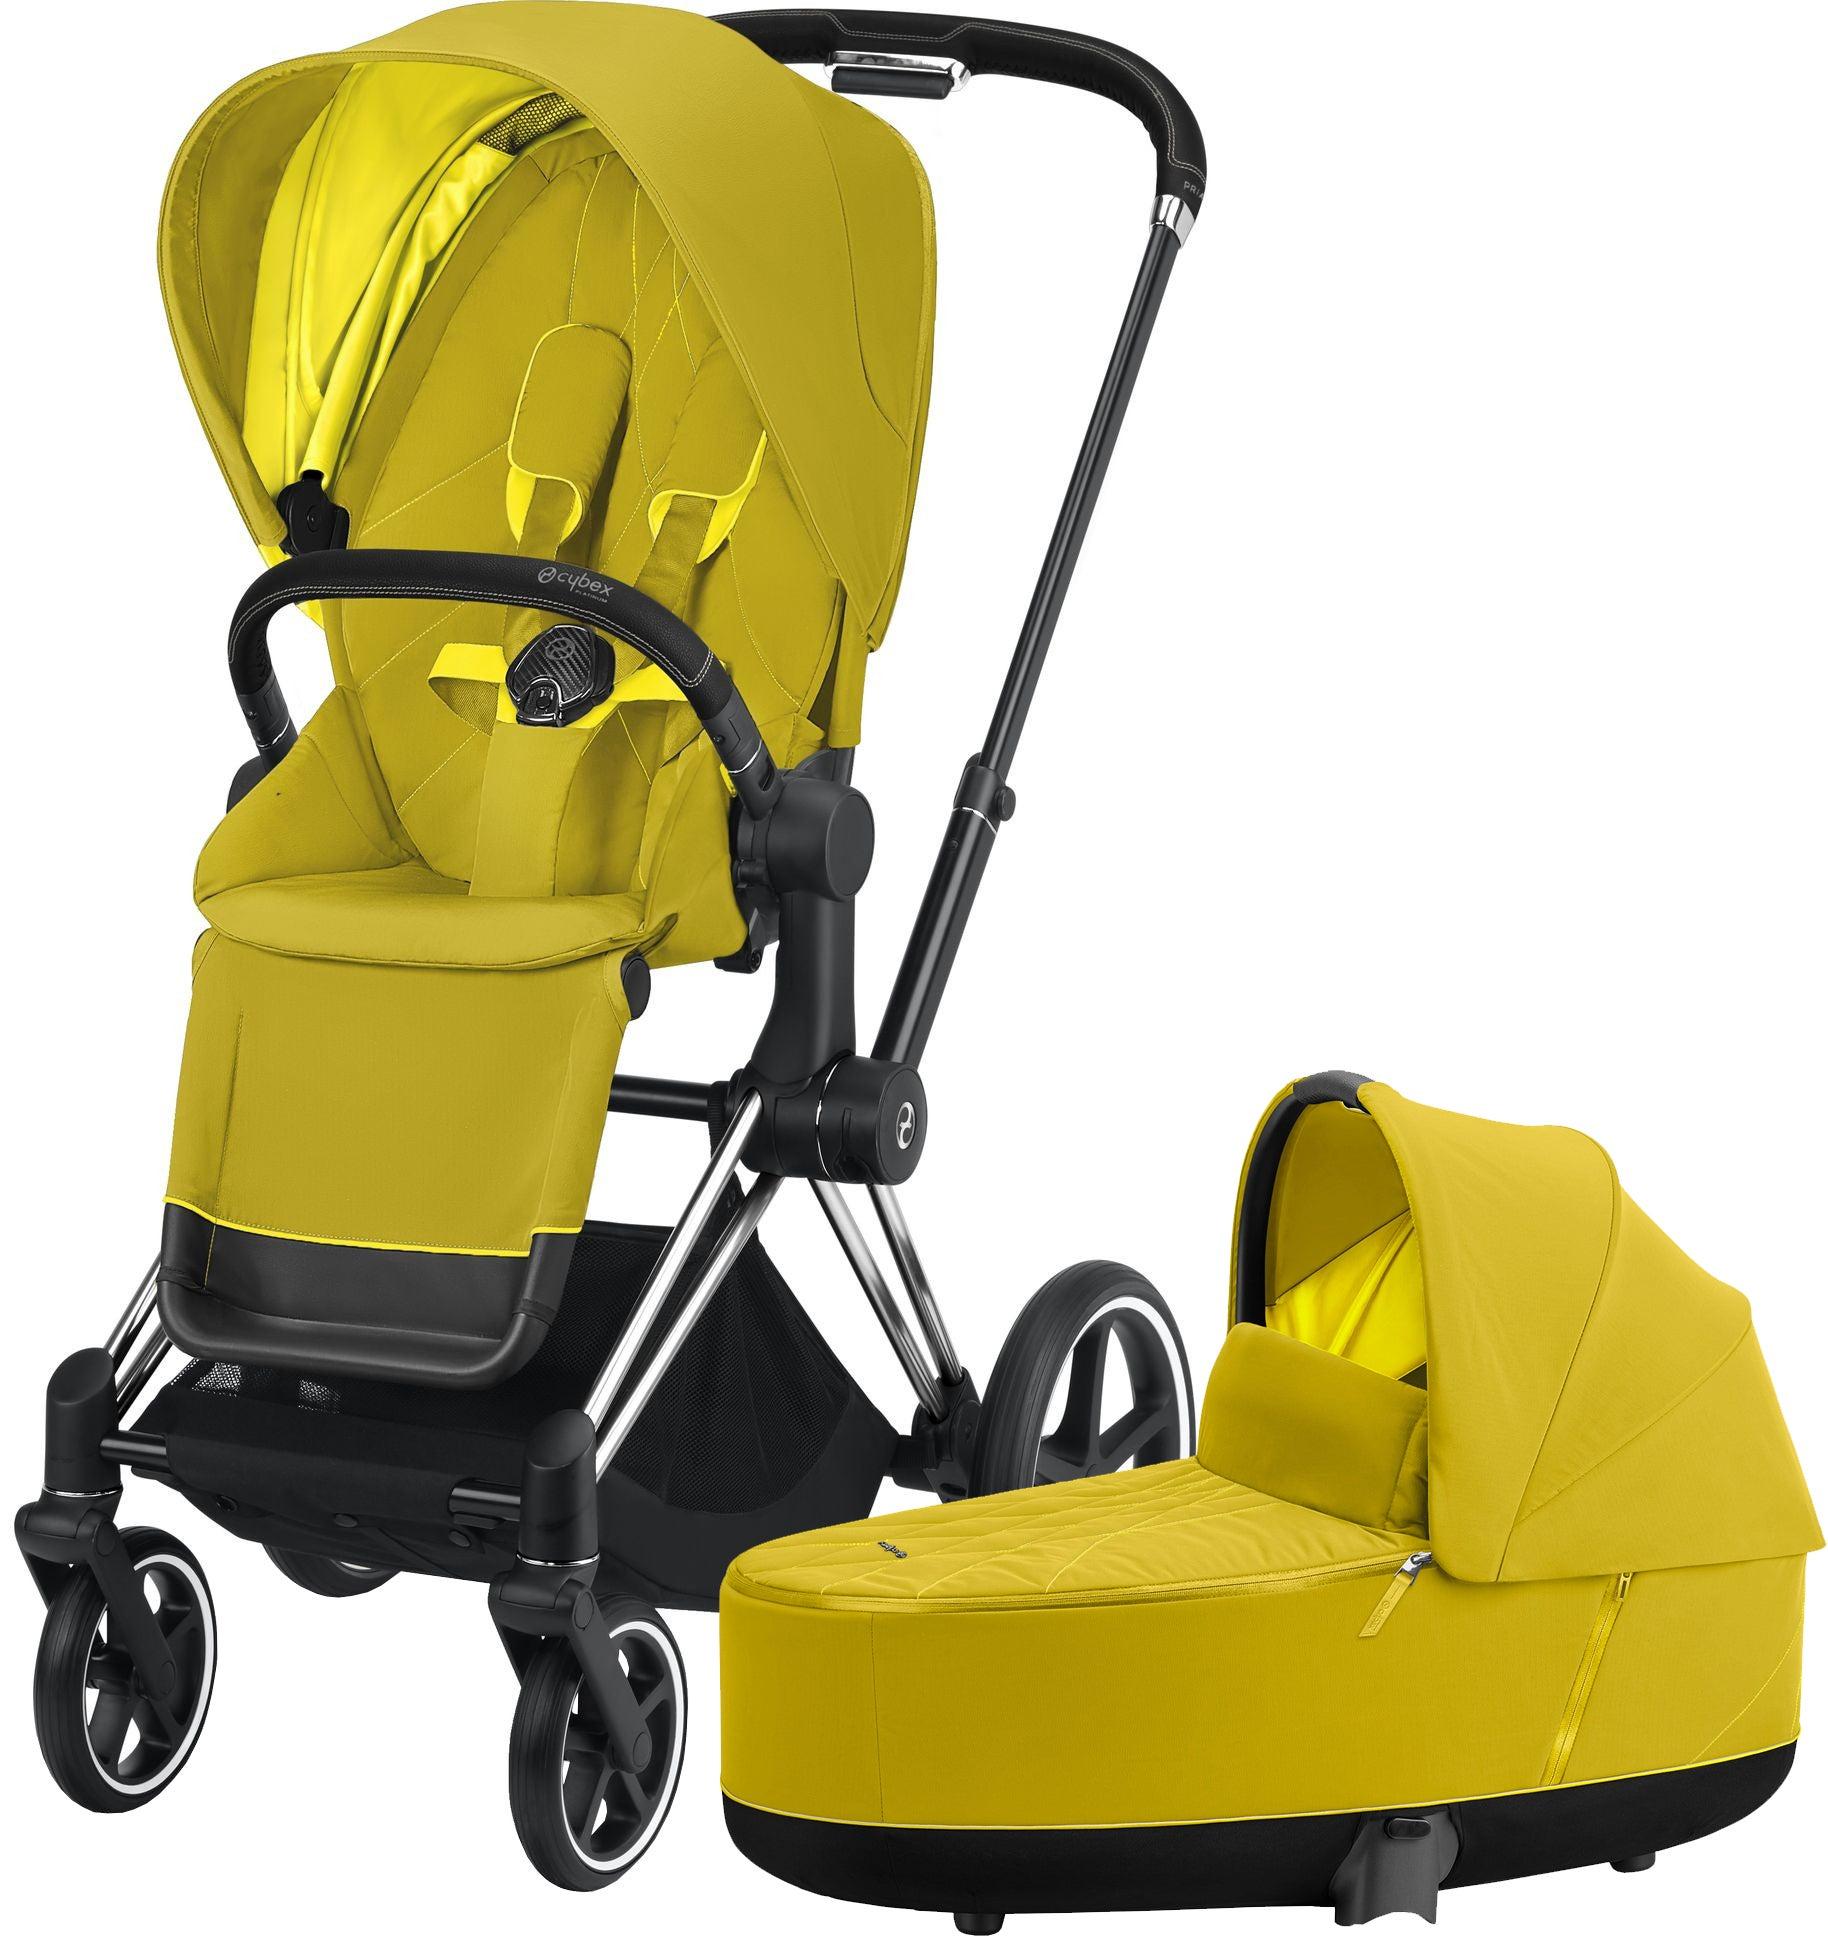 Cybex Priam Duovagn, Mustard Yellow/Chrome Black